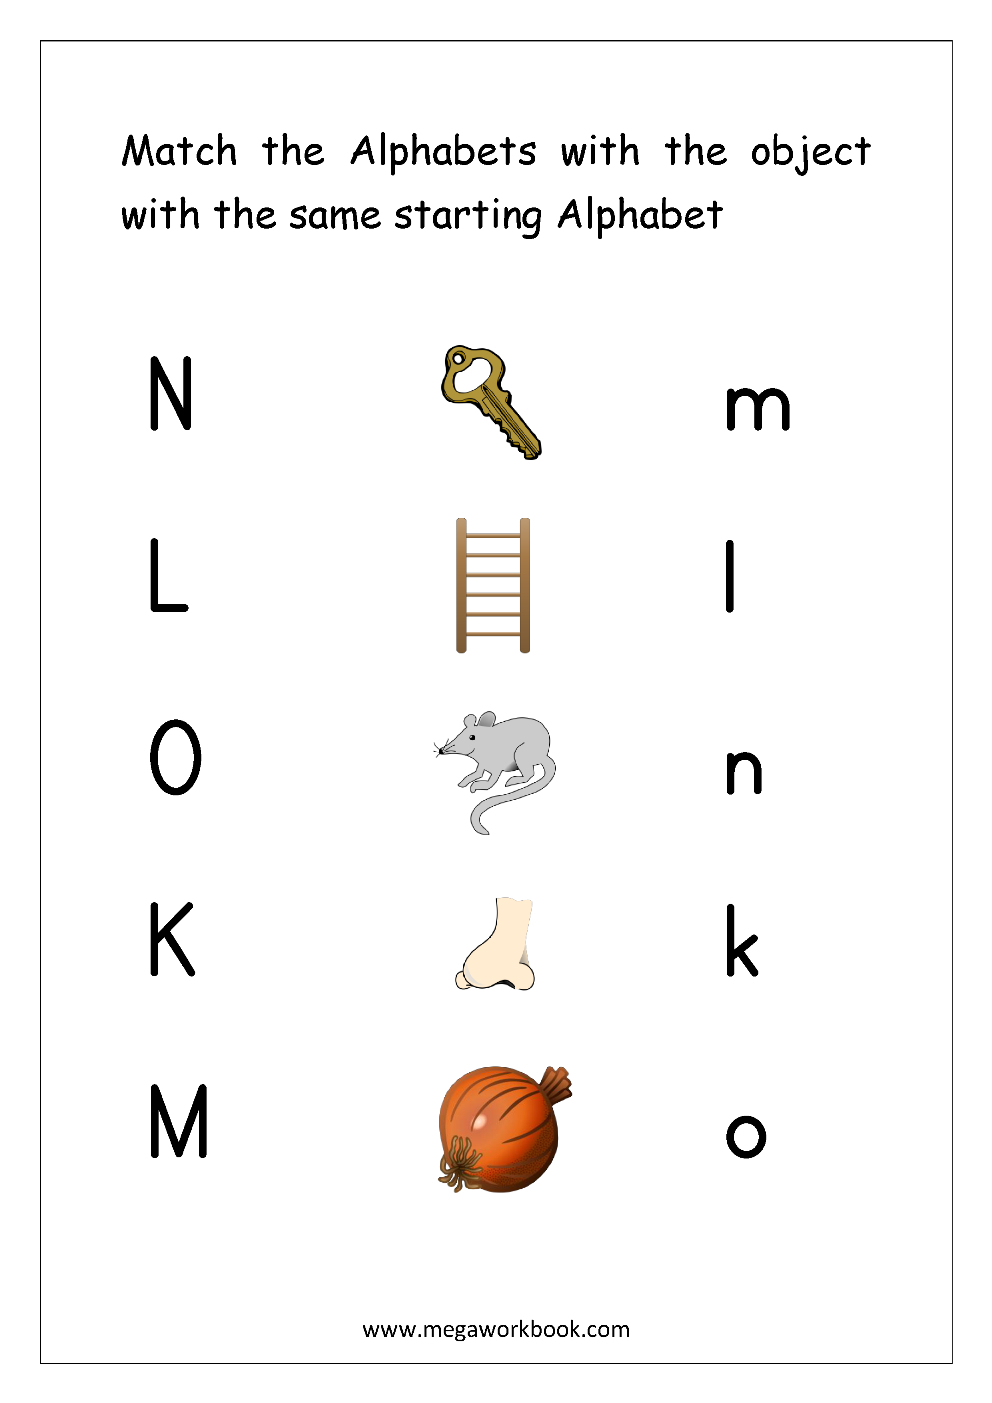 Free English Worksheets - Alphabet Matching - Megaworkbook within Alphabet Matching Worksheets For Kindergarten